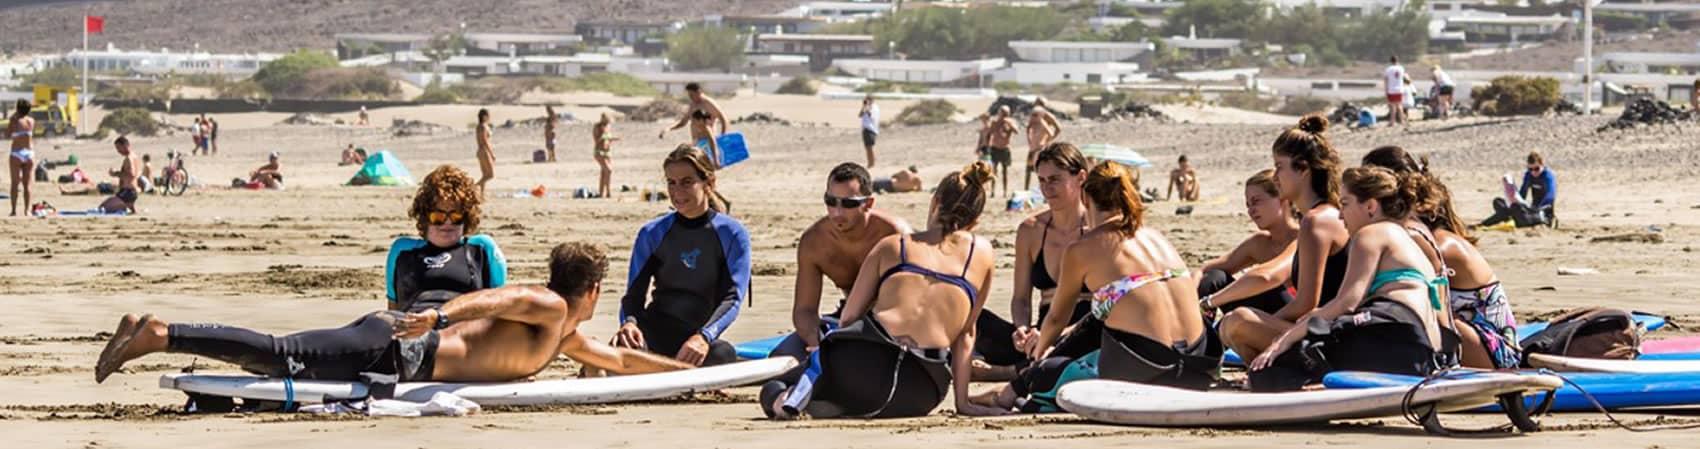 Surf Holidays in Lanzarote